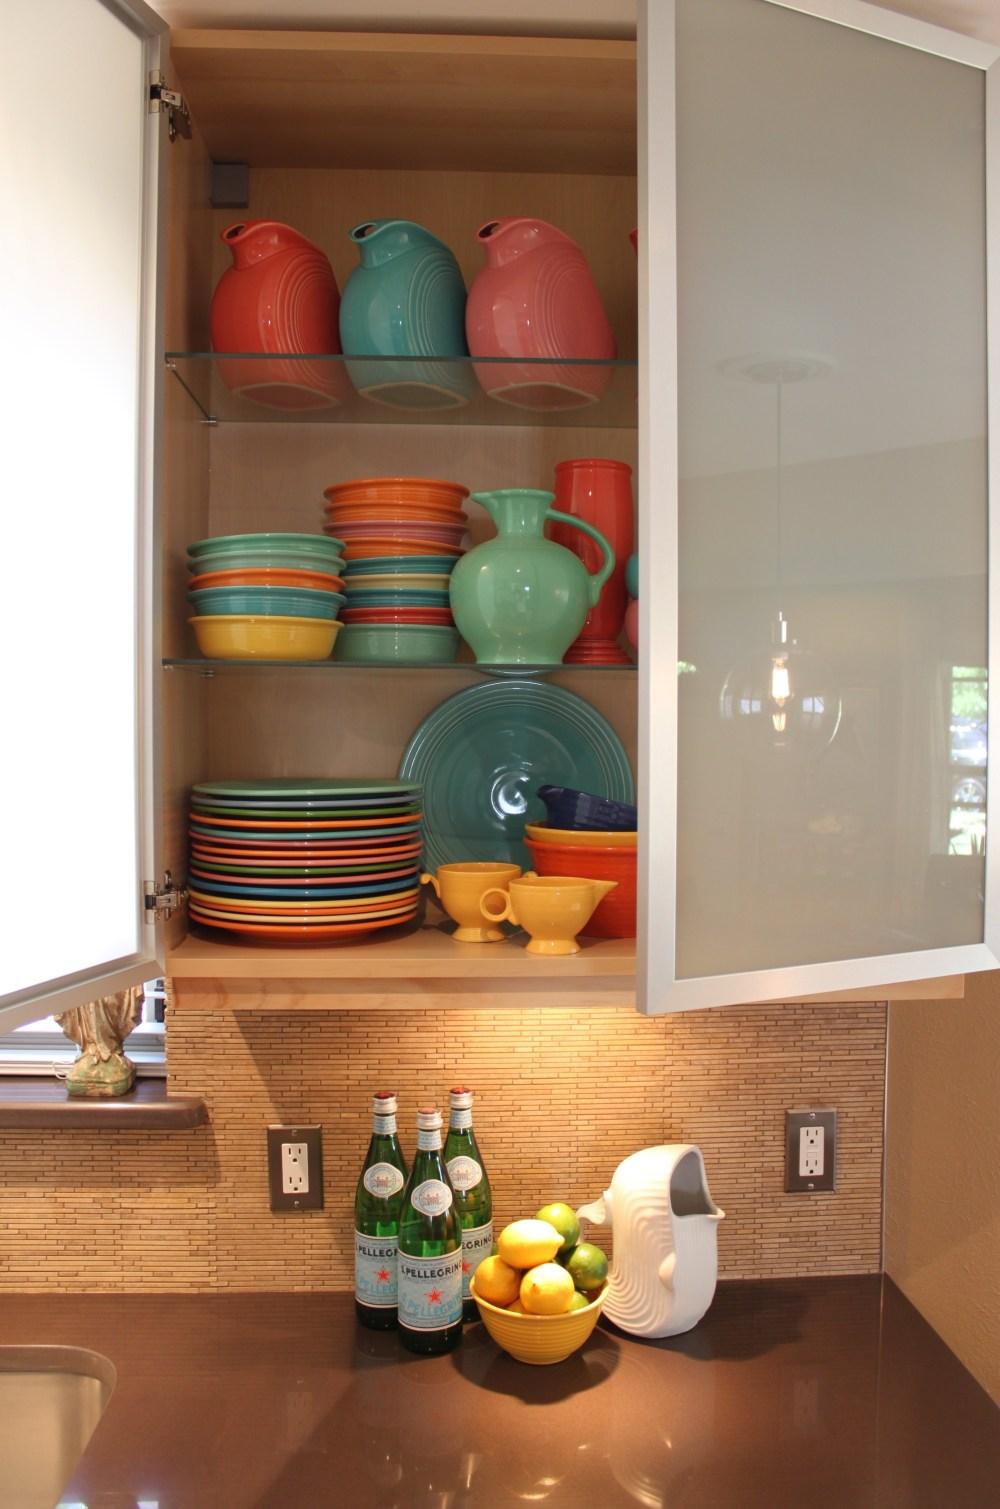 Cabinet full of Fiesta